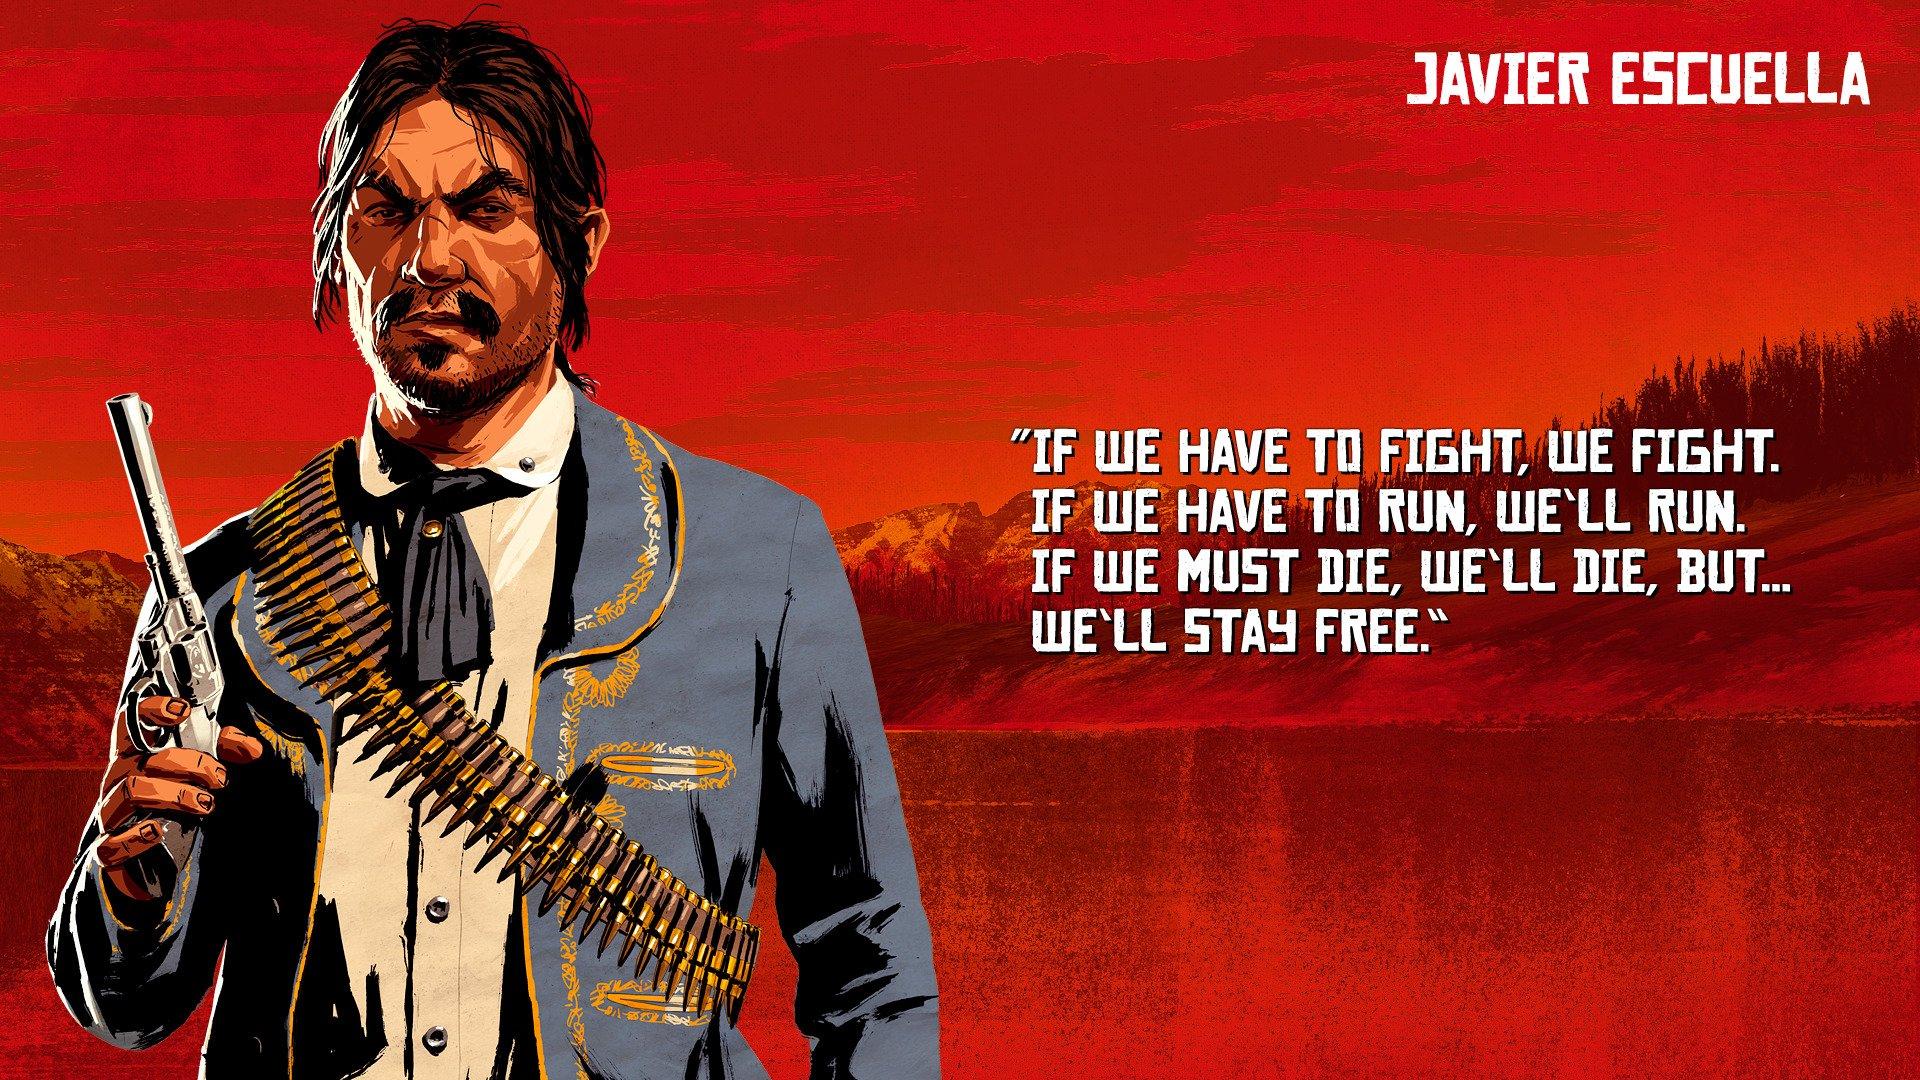 Rockstar Games revela artes dos personagens de Red Dead Redemption 2; veja 1